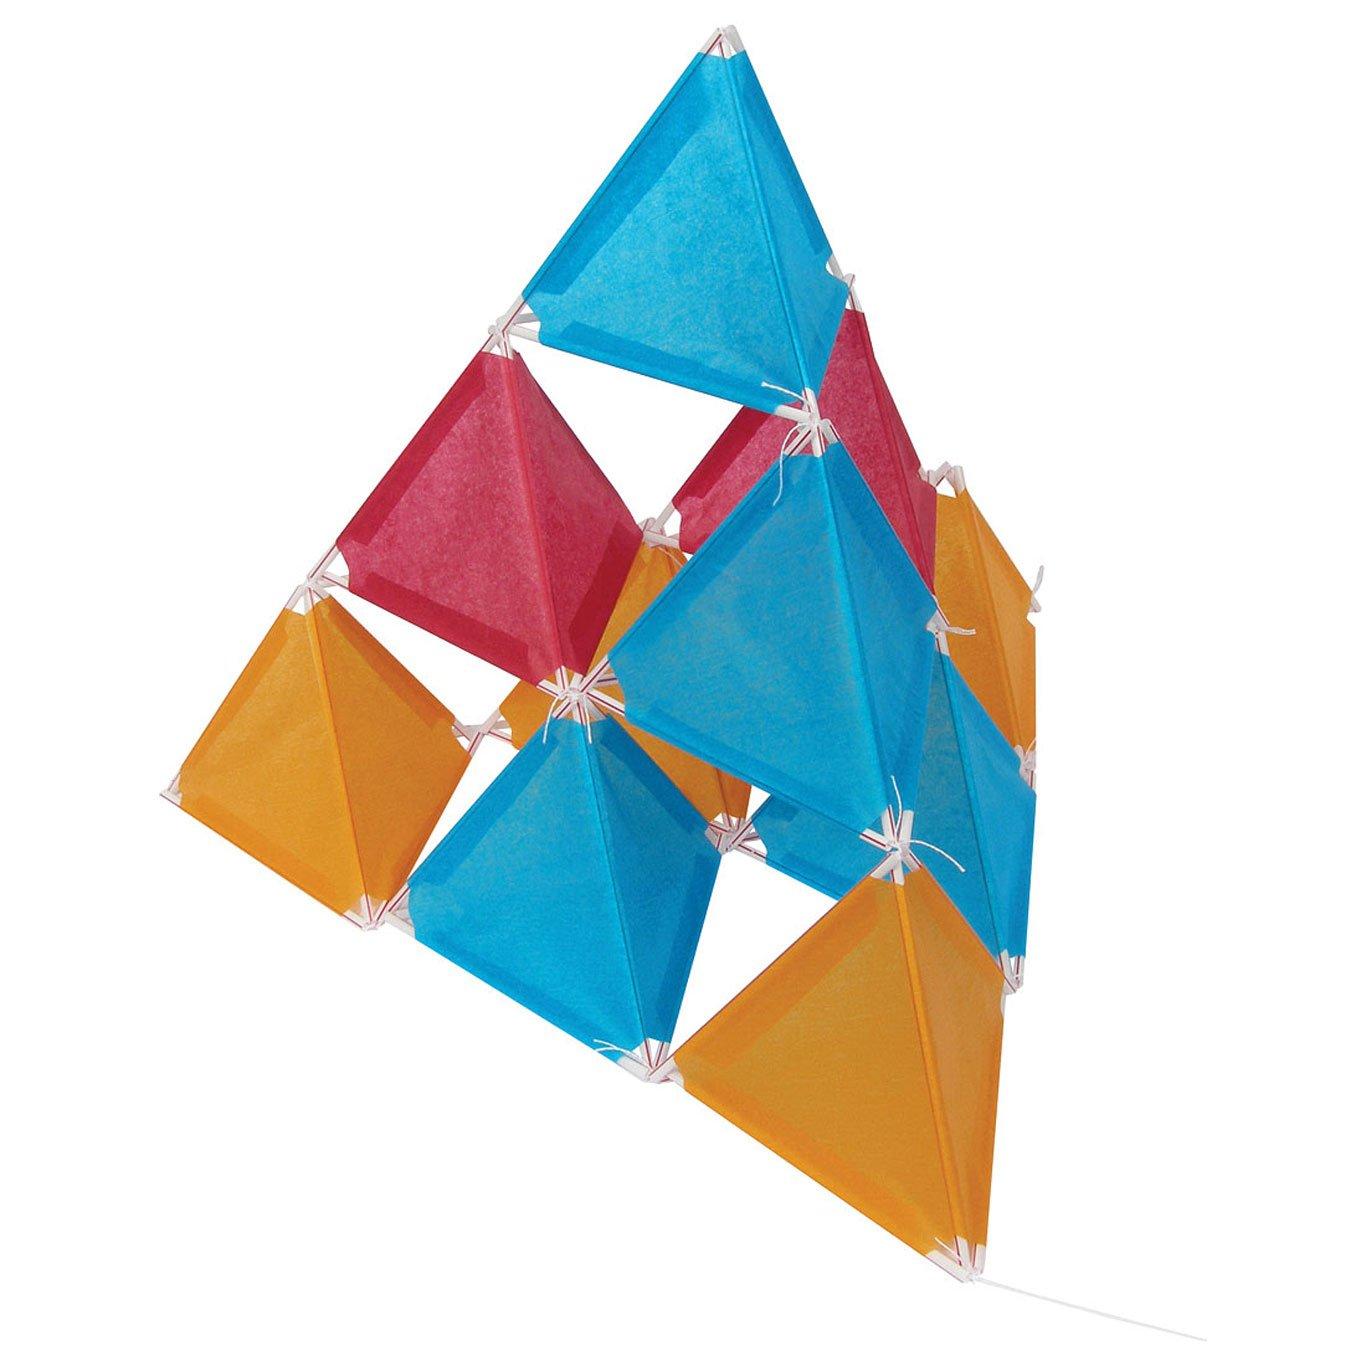 KaZoon-Kite-10-cell-1366-0318.jpg